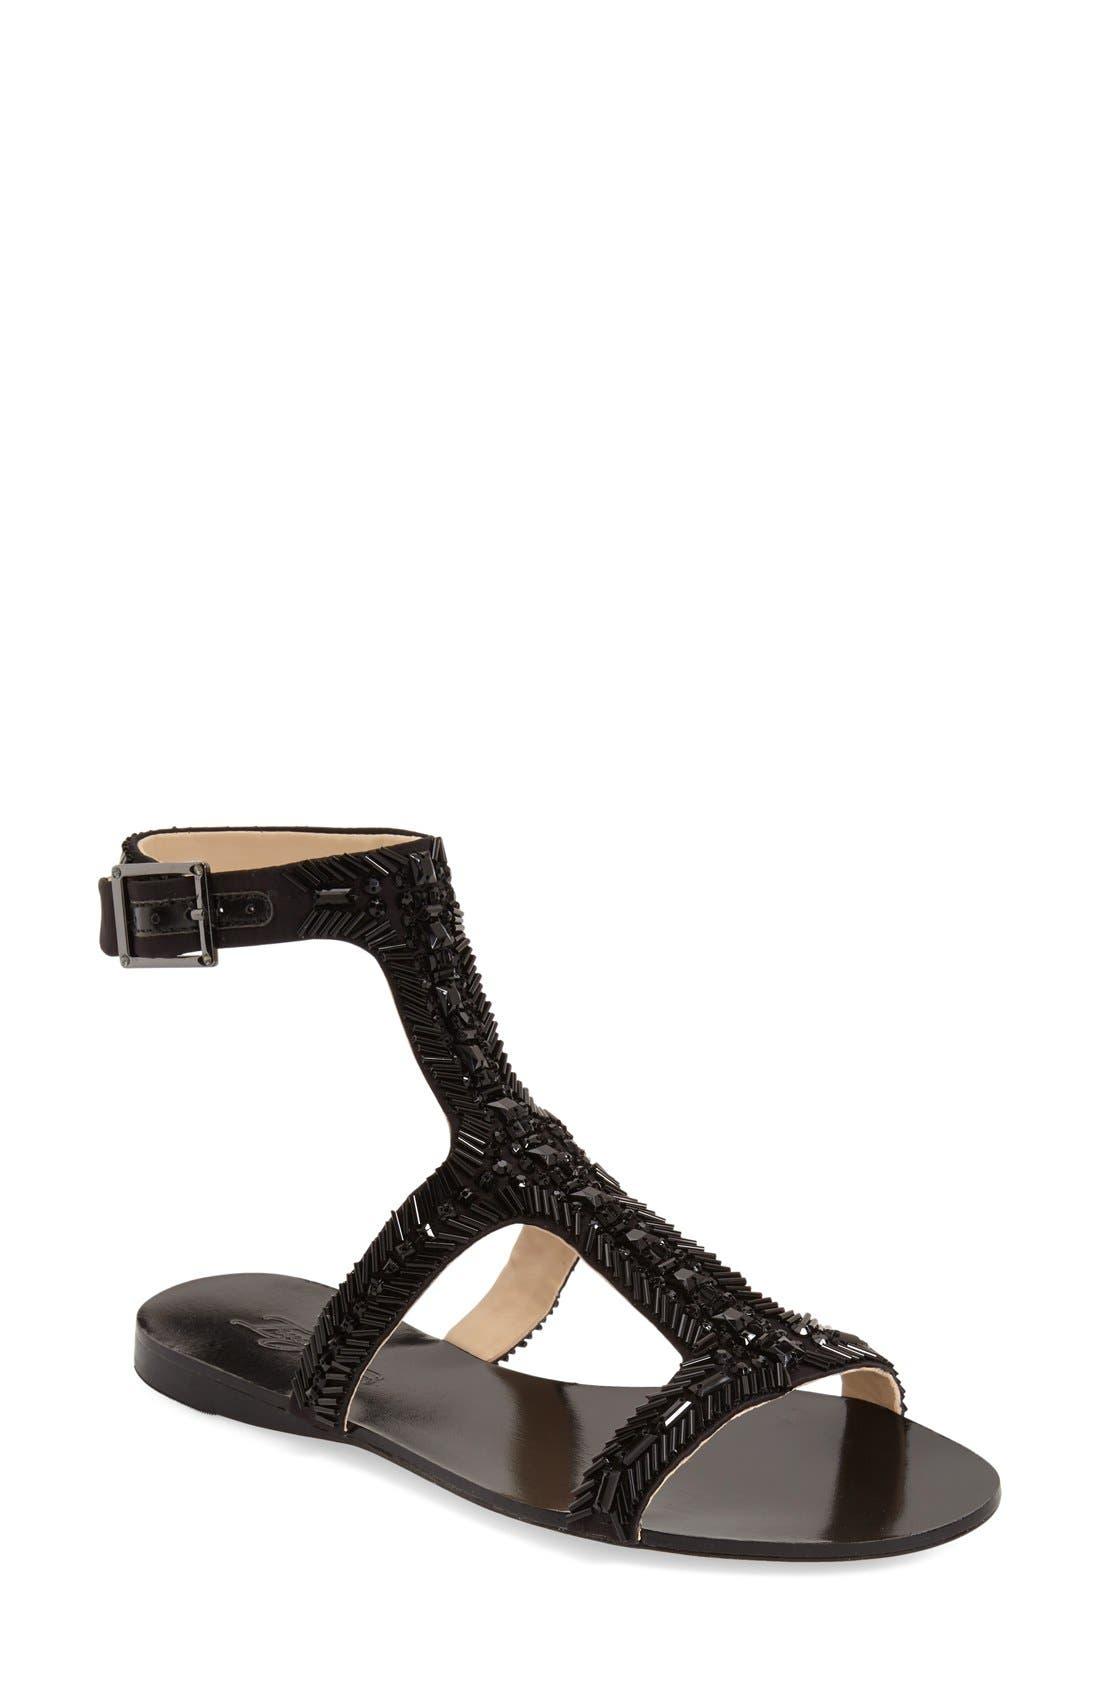 Imagine Vince Camuto 'Reid' Embellished T-Strap Flat Sandal,                             Main thumbnail 1, color,                             Black